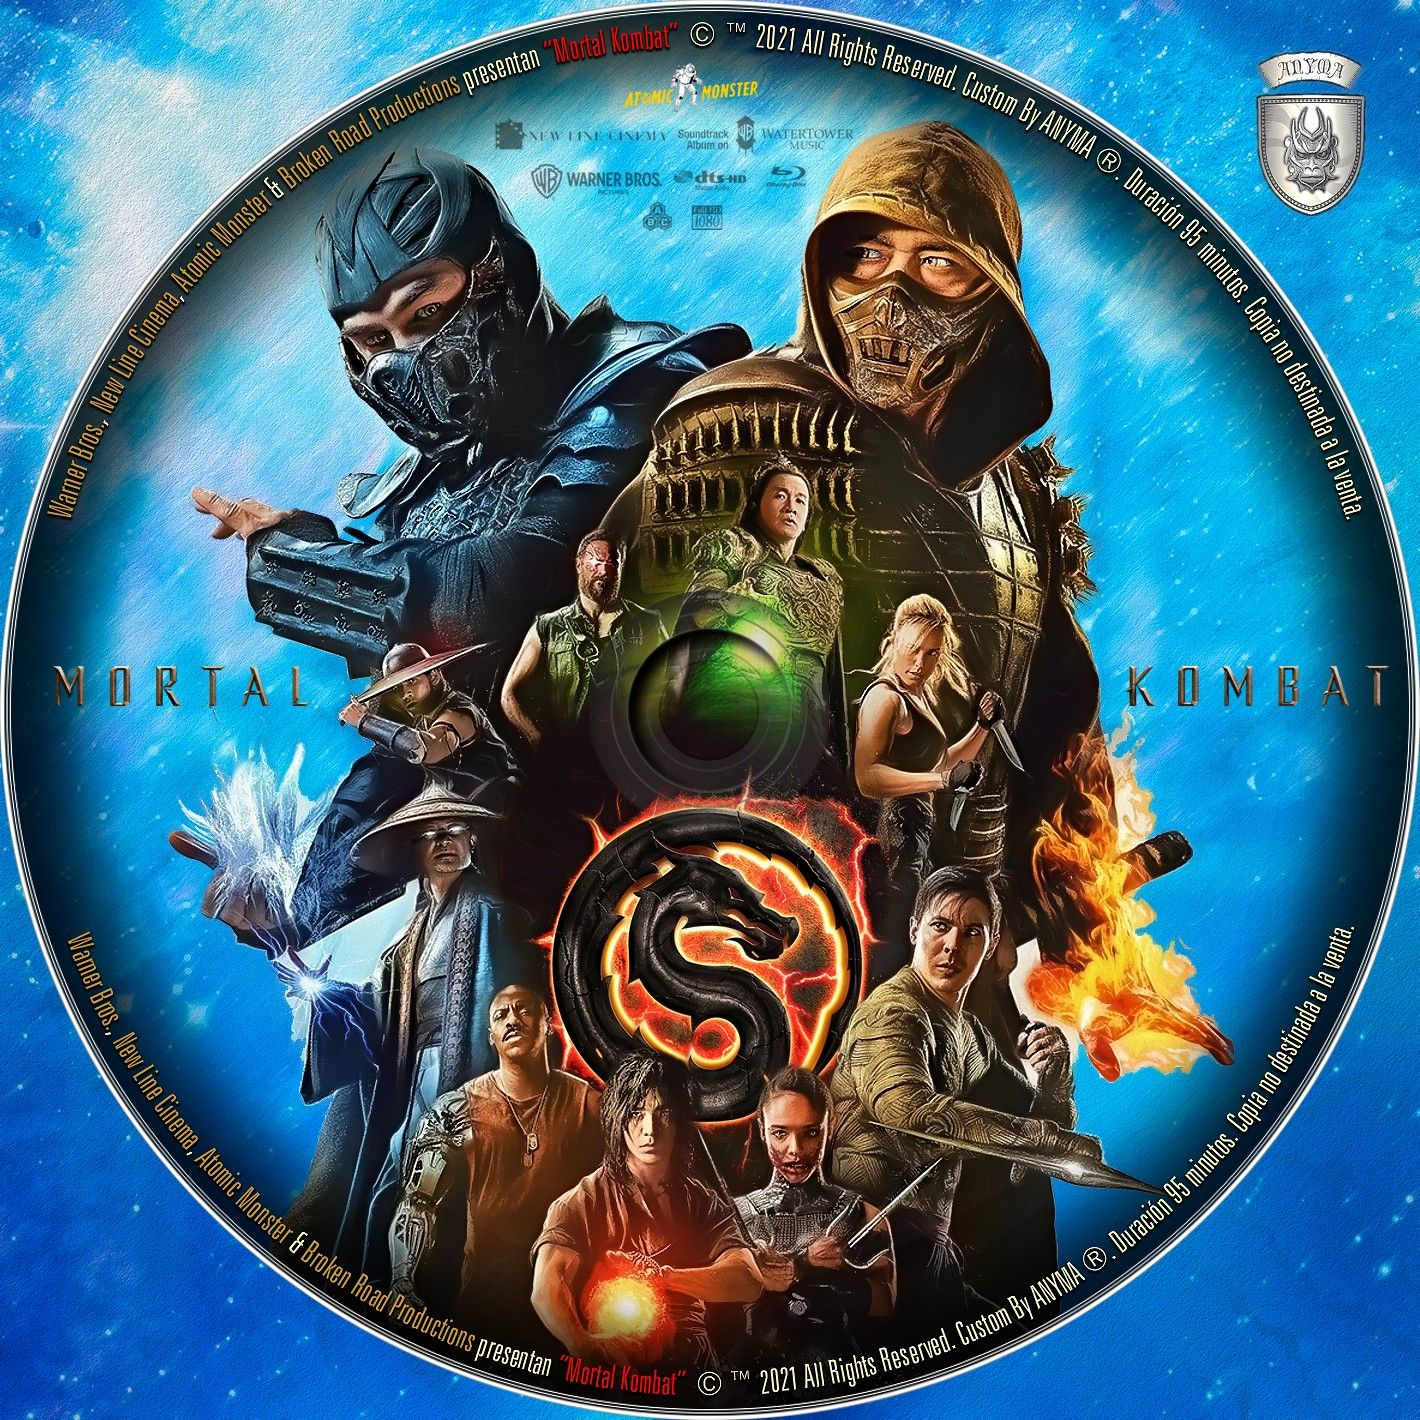 Mortal Kombat 2021 In 2021 Mortal Kombat Mortal Kombat Art Kitana Mortal Kombat